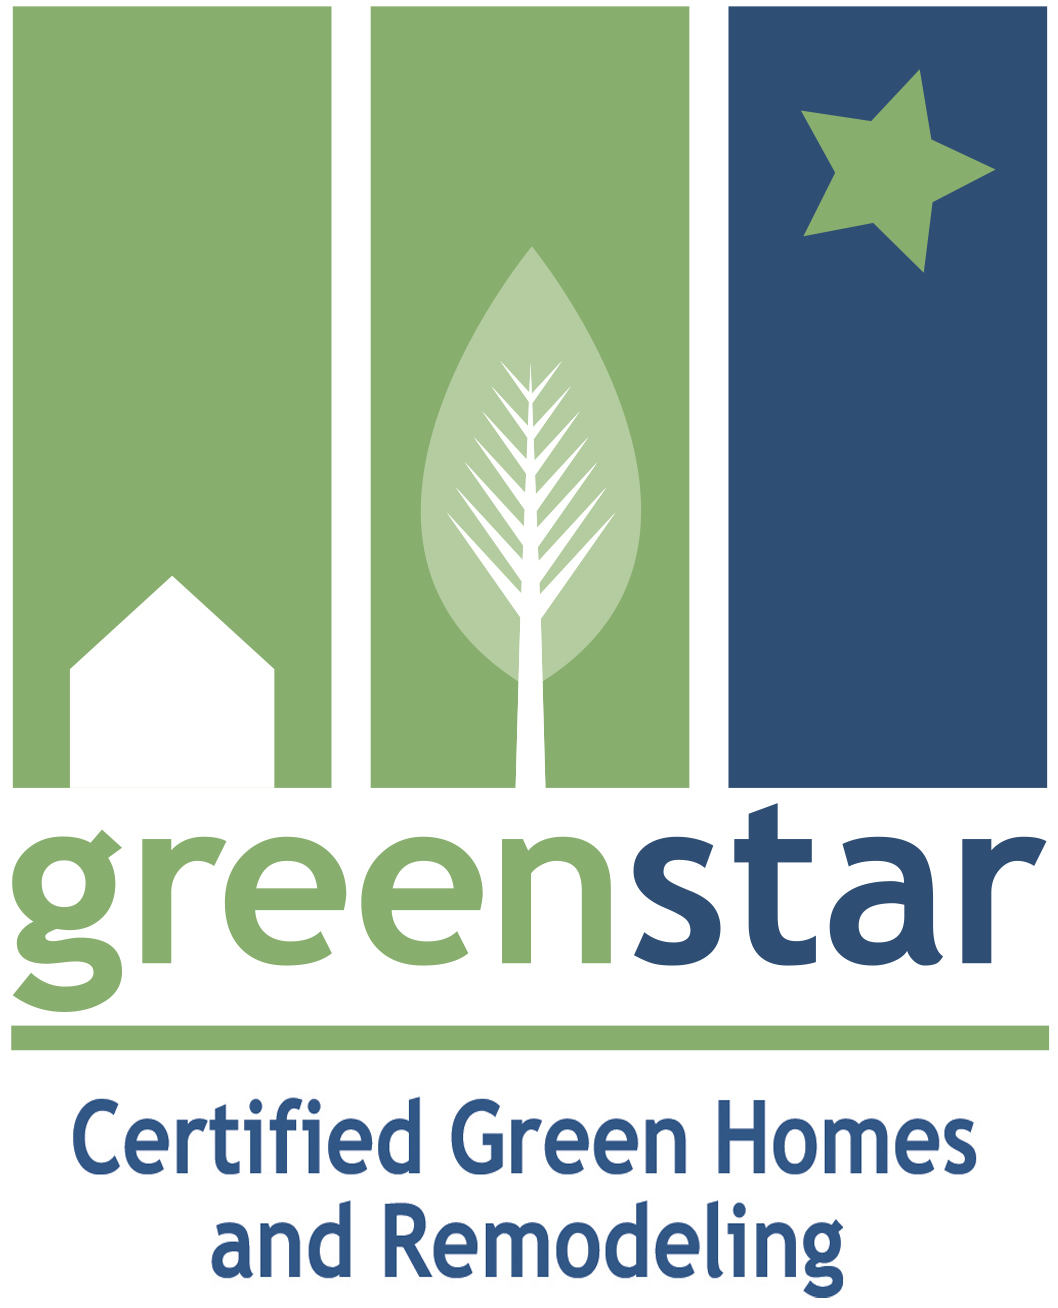 Greenstar Residential Remodeling Certification Is Here